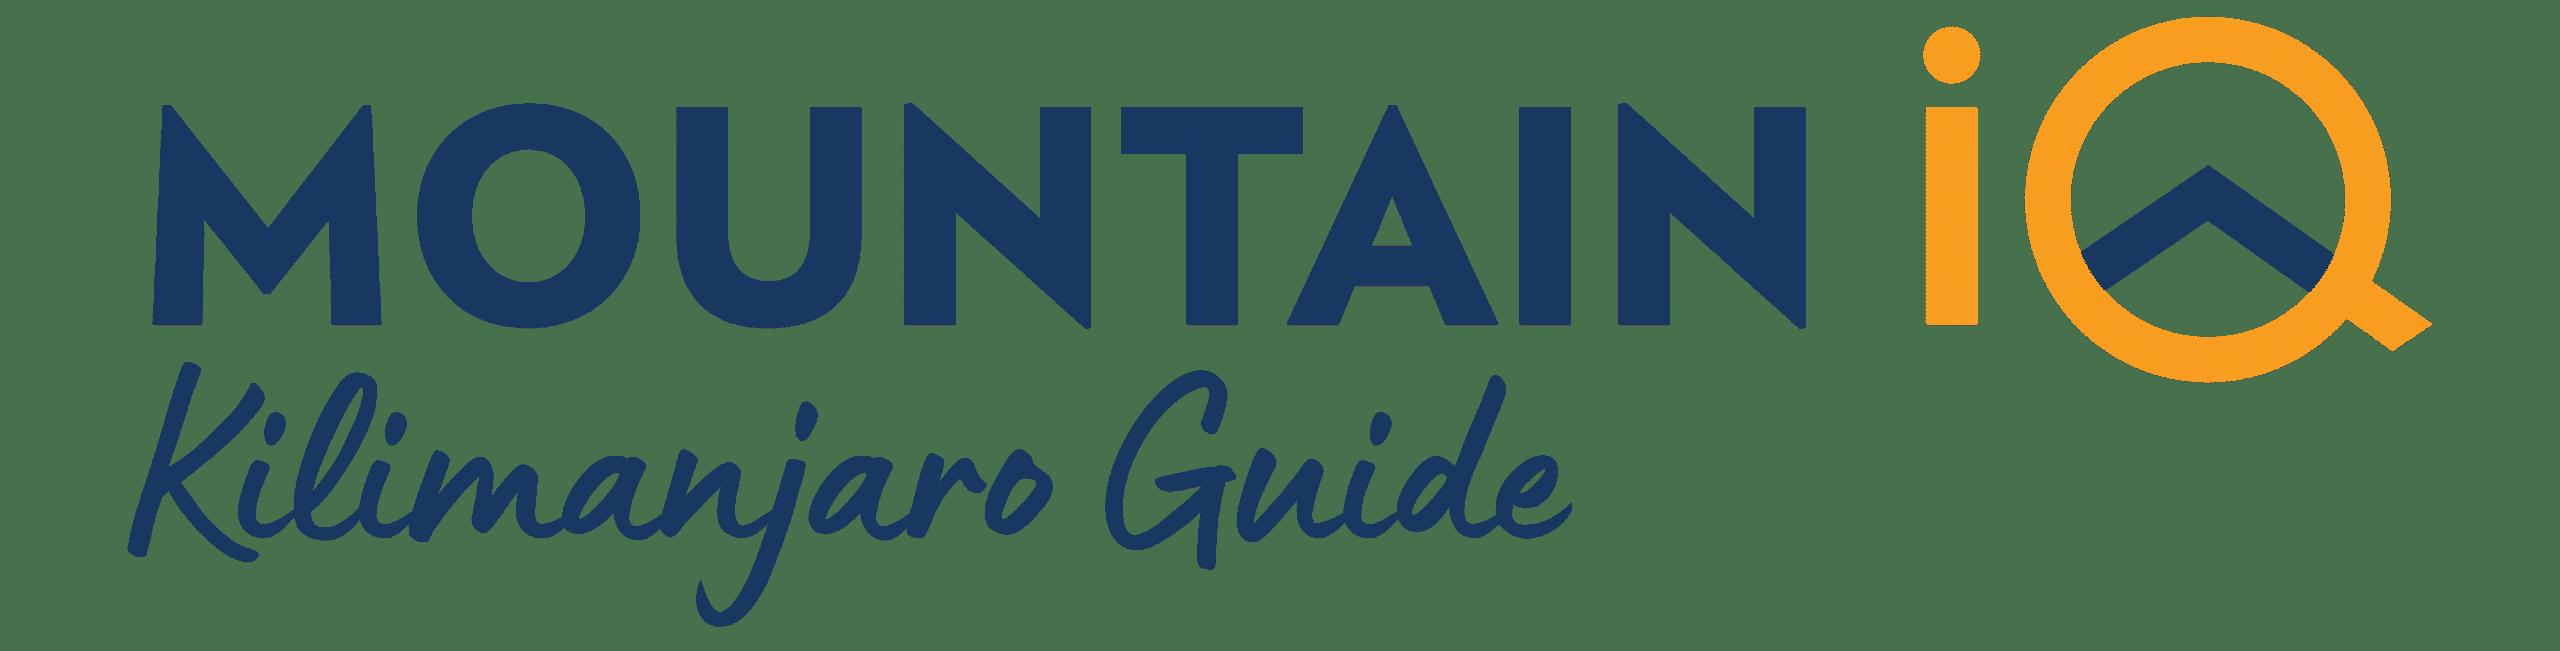 Climb Kilimanjaro Guide